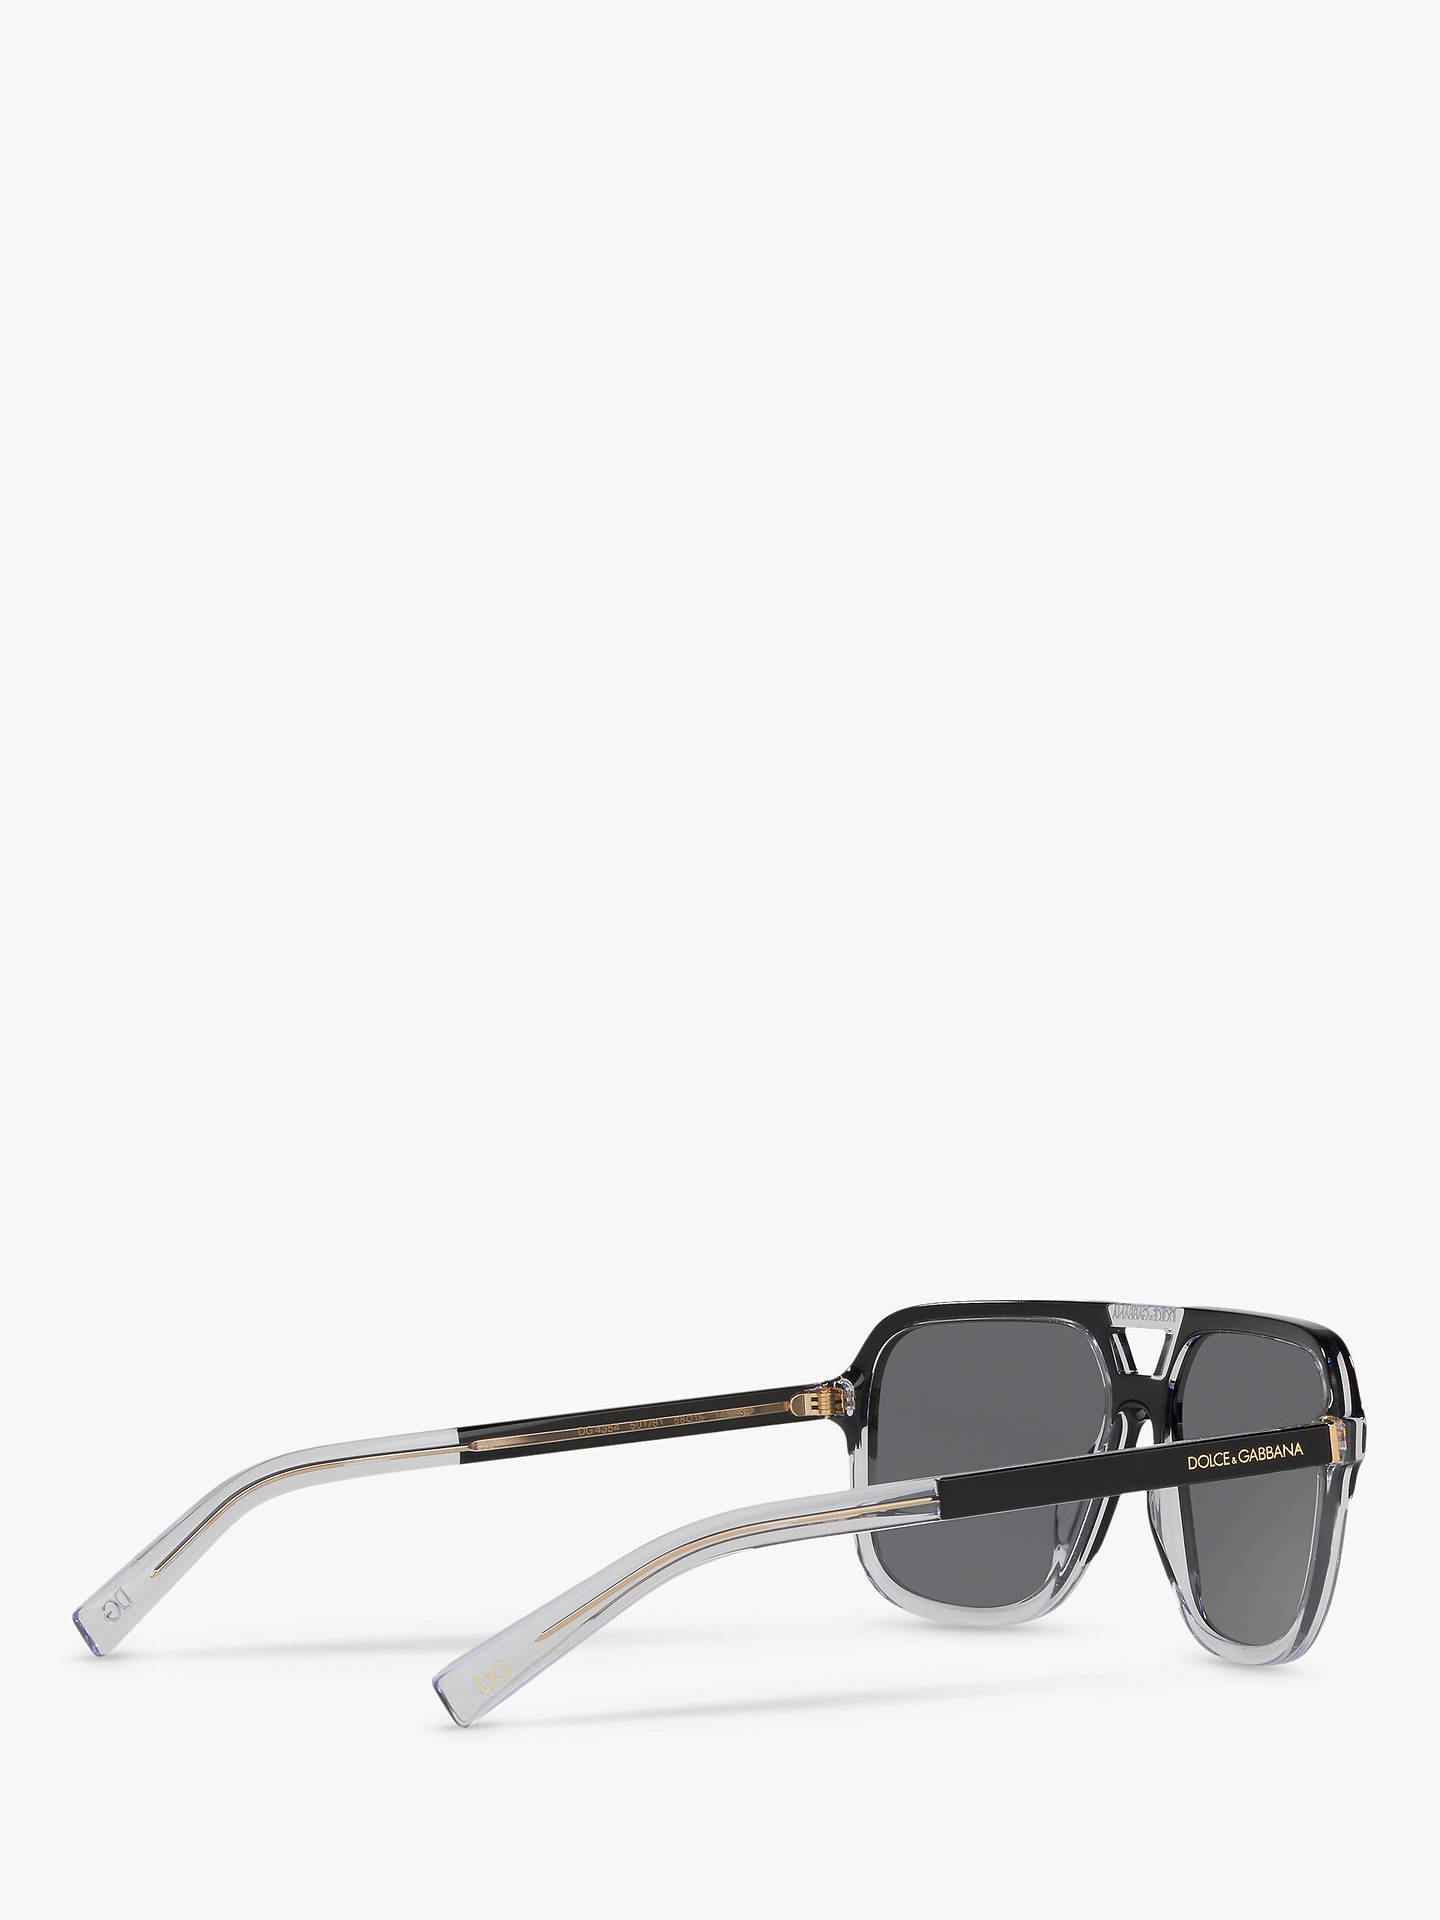 38b77f59610dd ... Buy Dolce   Gabbana DG4354 Men s Polarised Square Sunglasses